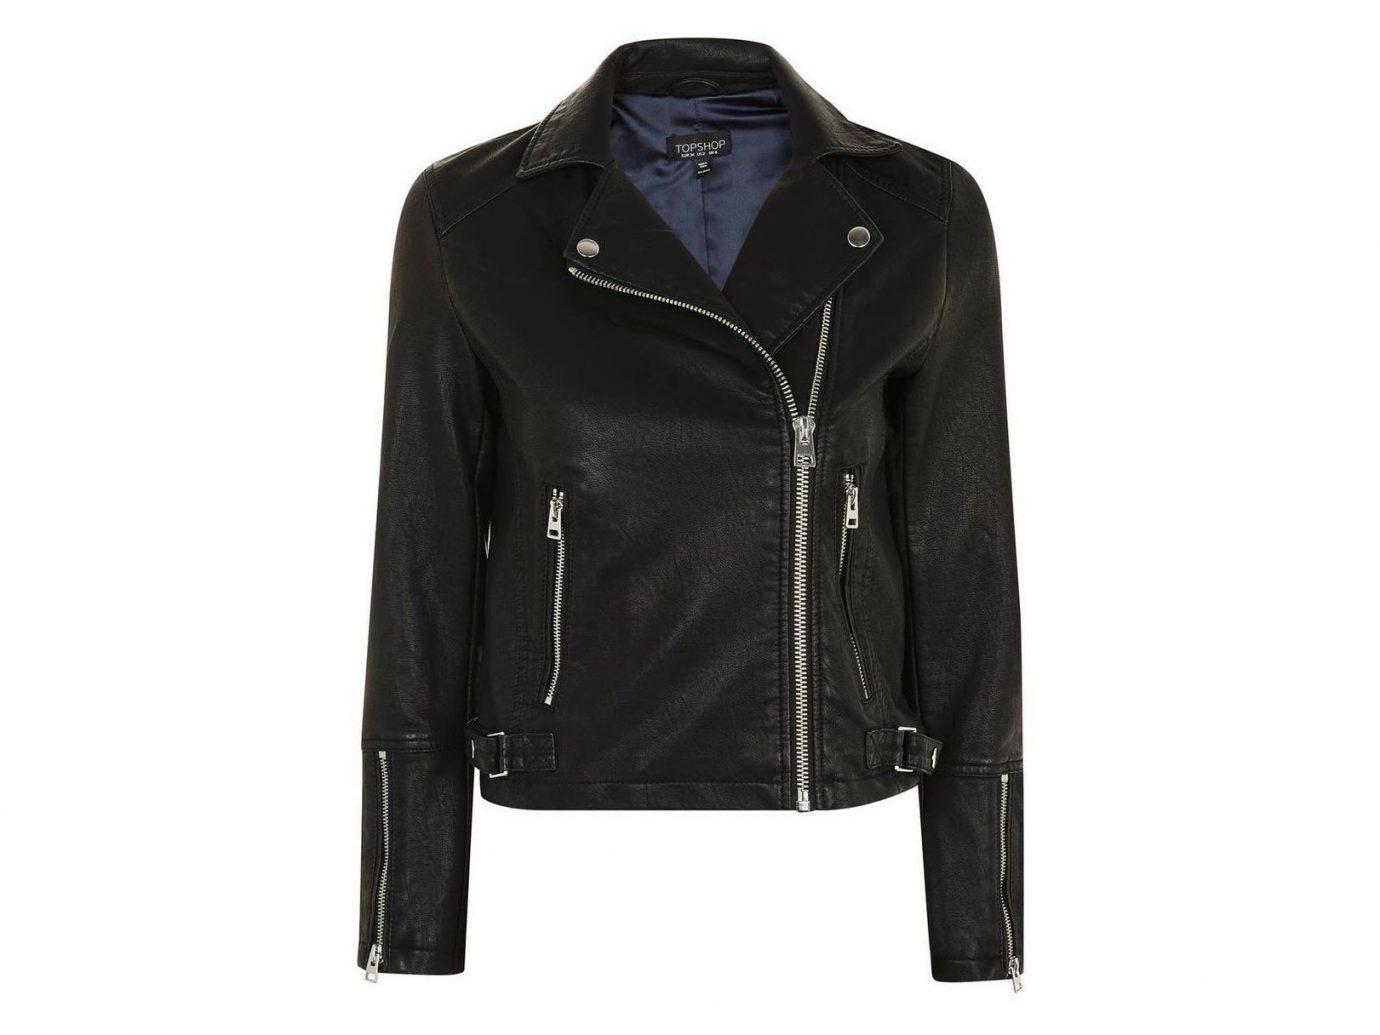 Celebs Style + Design Travel Shop clothing jacket black leather jacket leather suit zipper product posing coat dressed